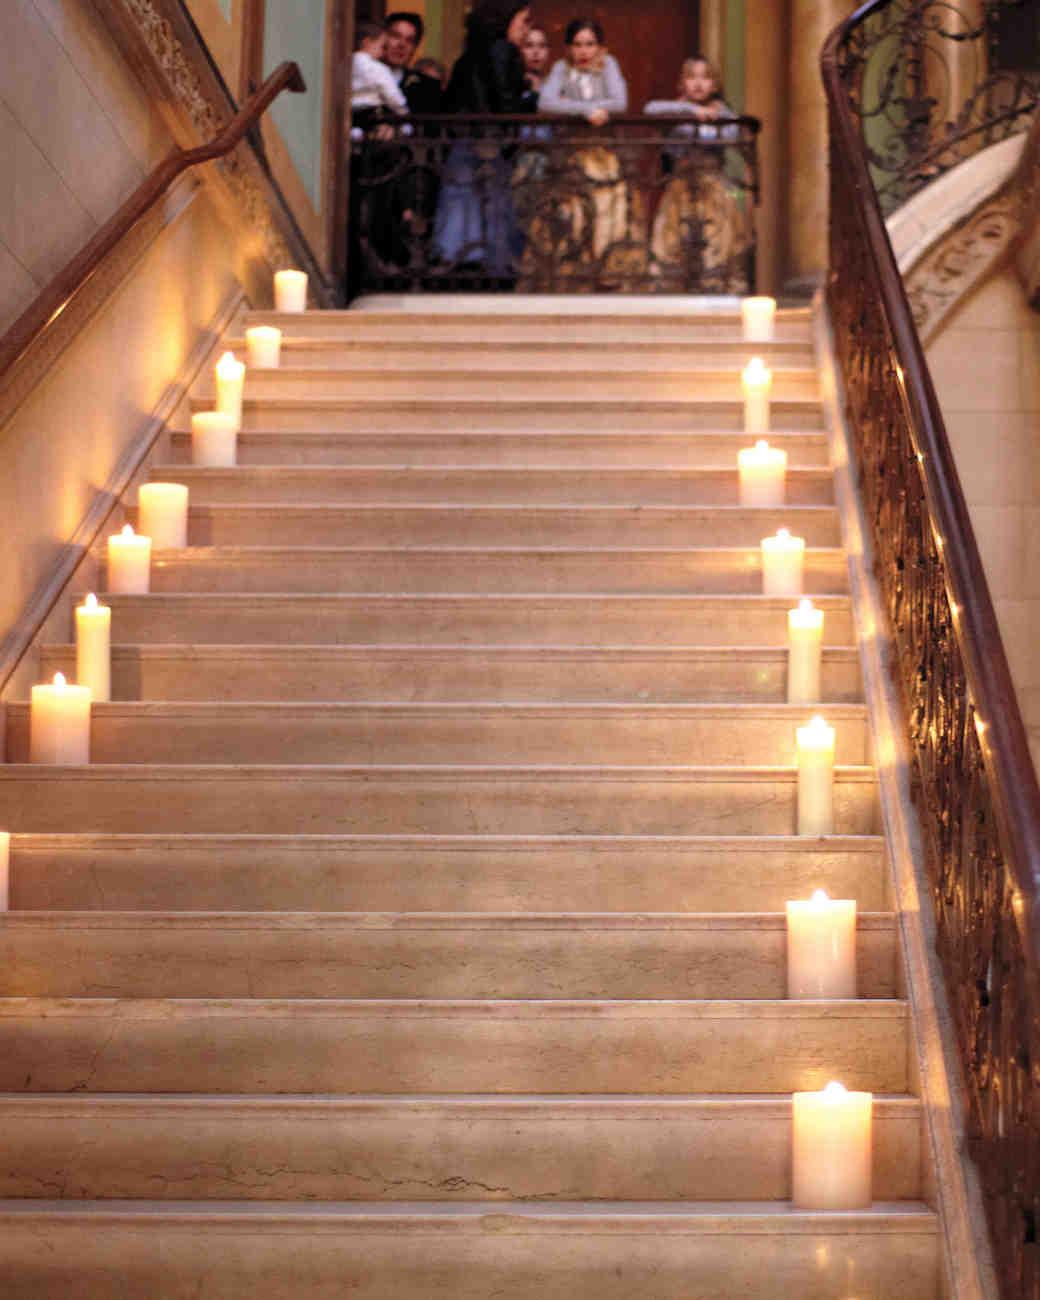 candles-0811mwd107282.jpg